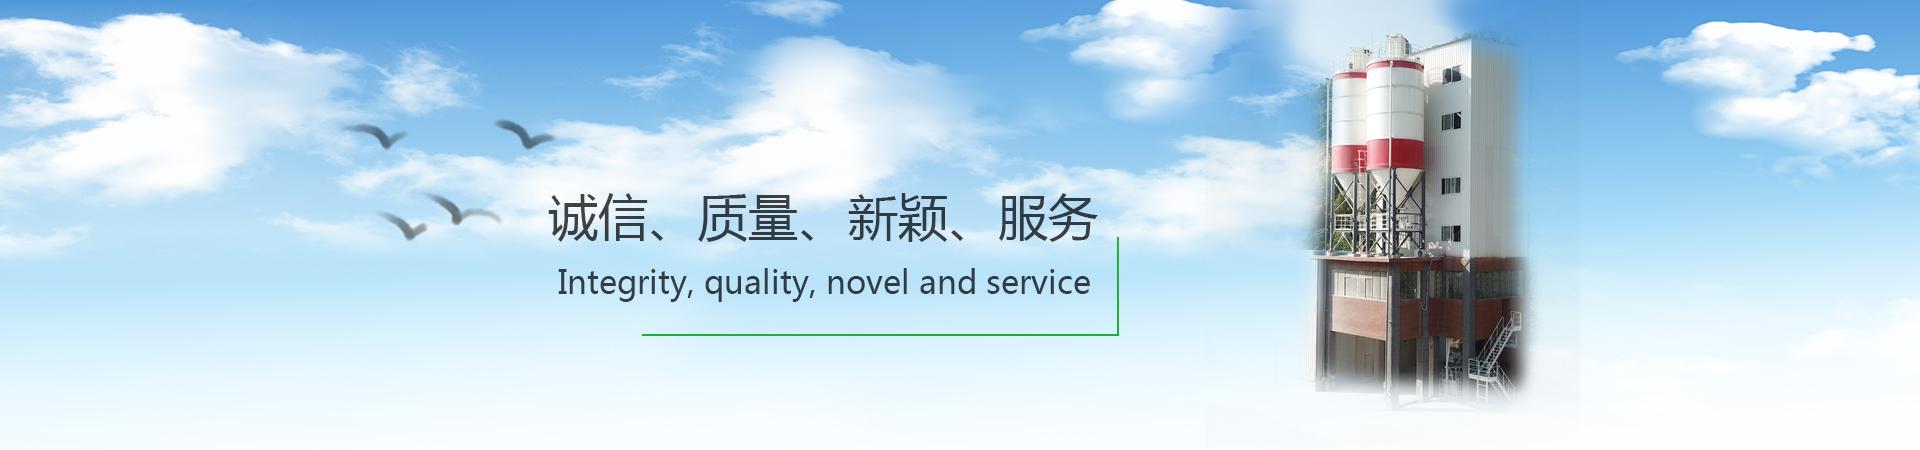 http://www.gzyshbjc.cn/data/upload/202104/20210425162826_332.jpg